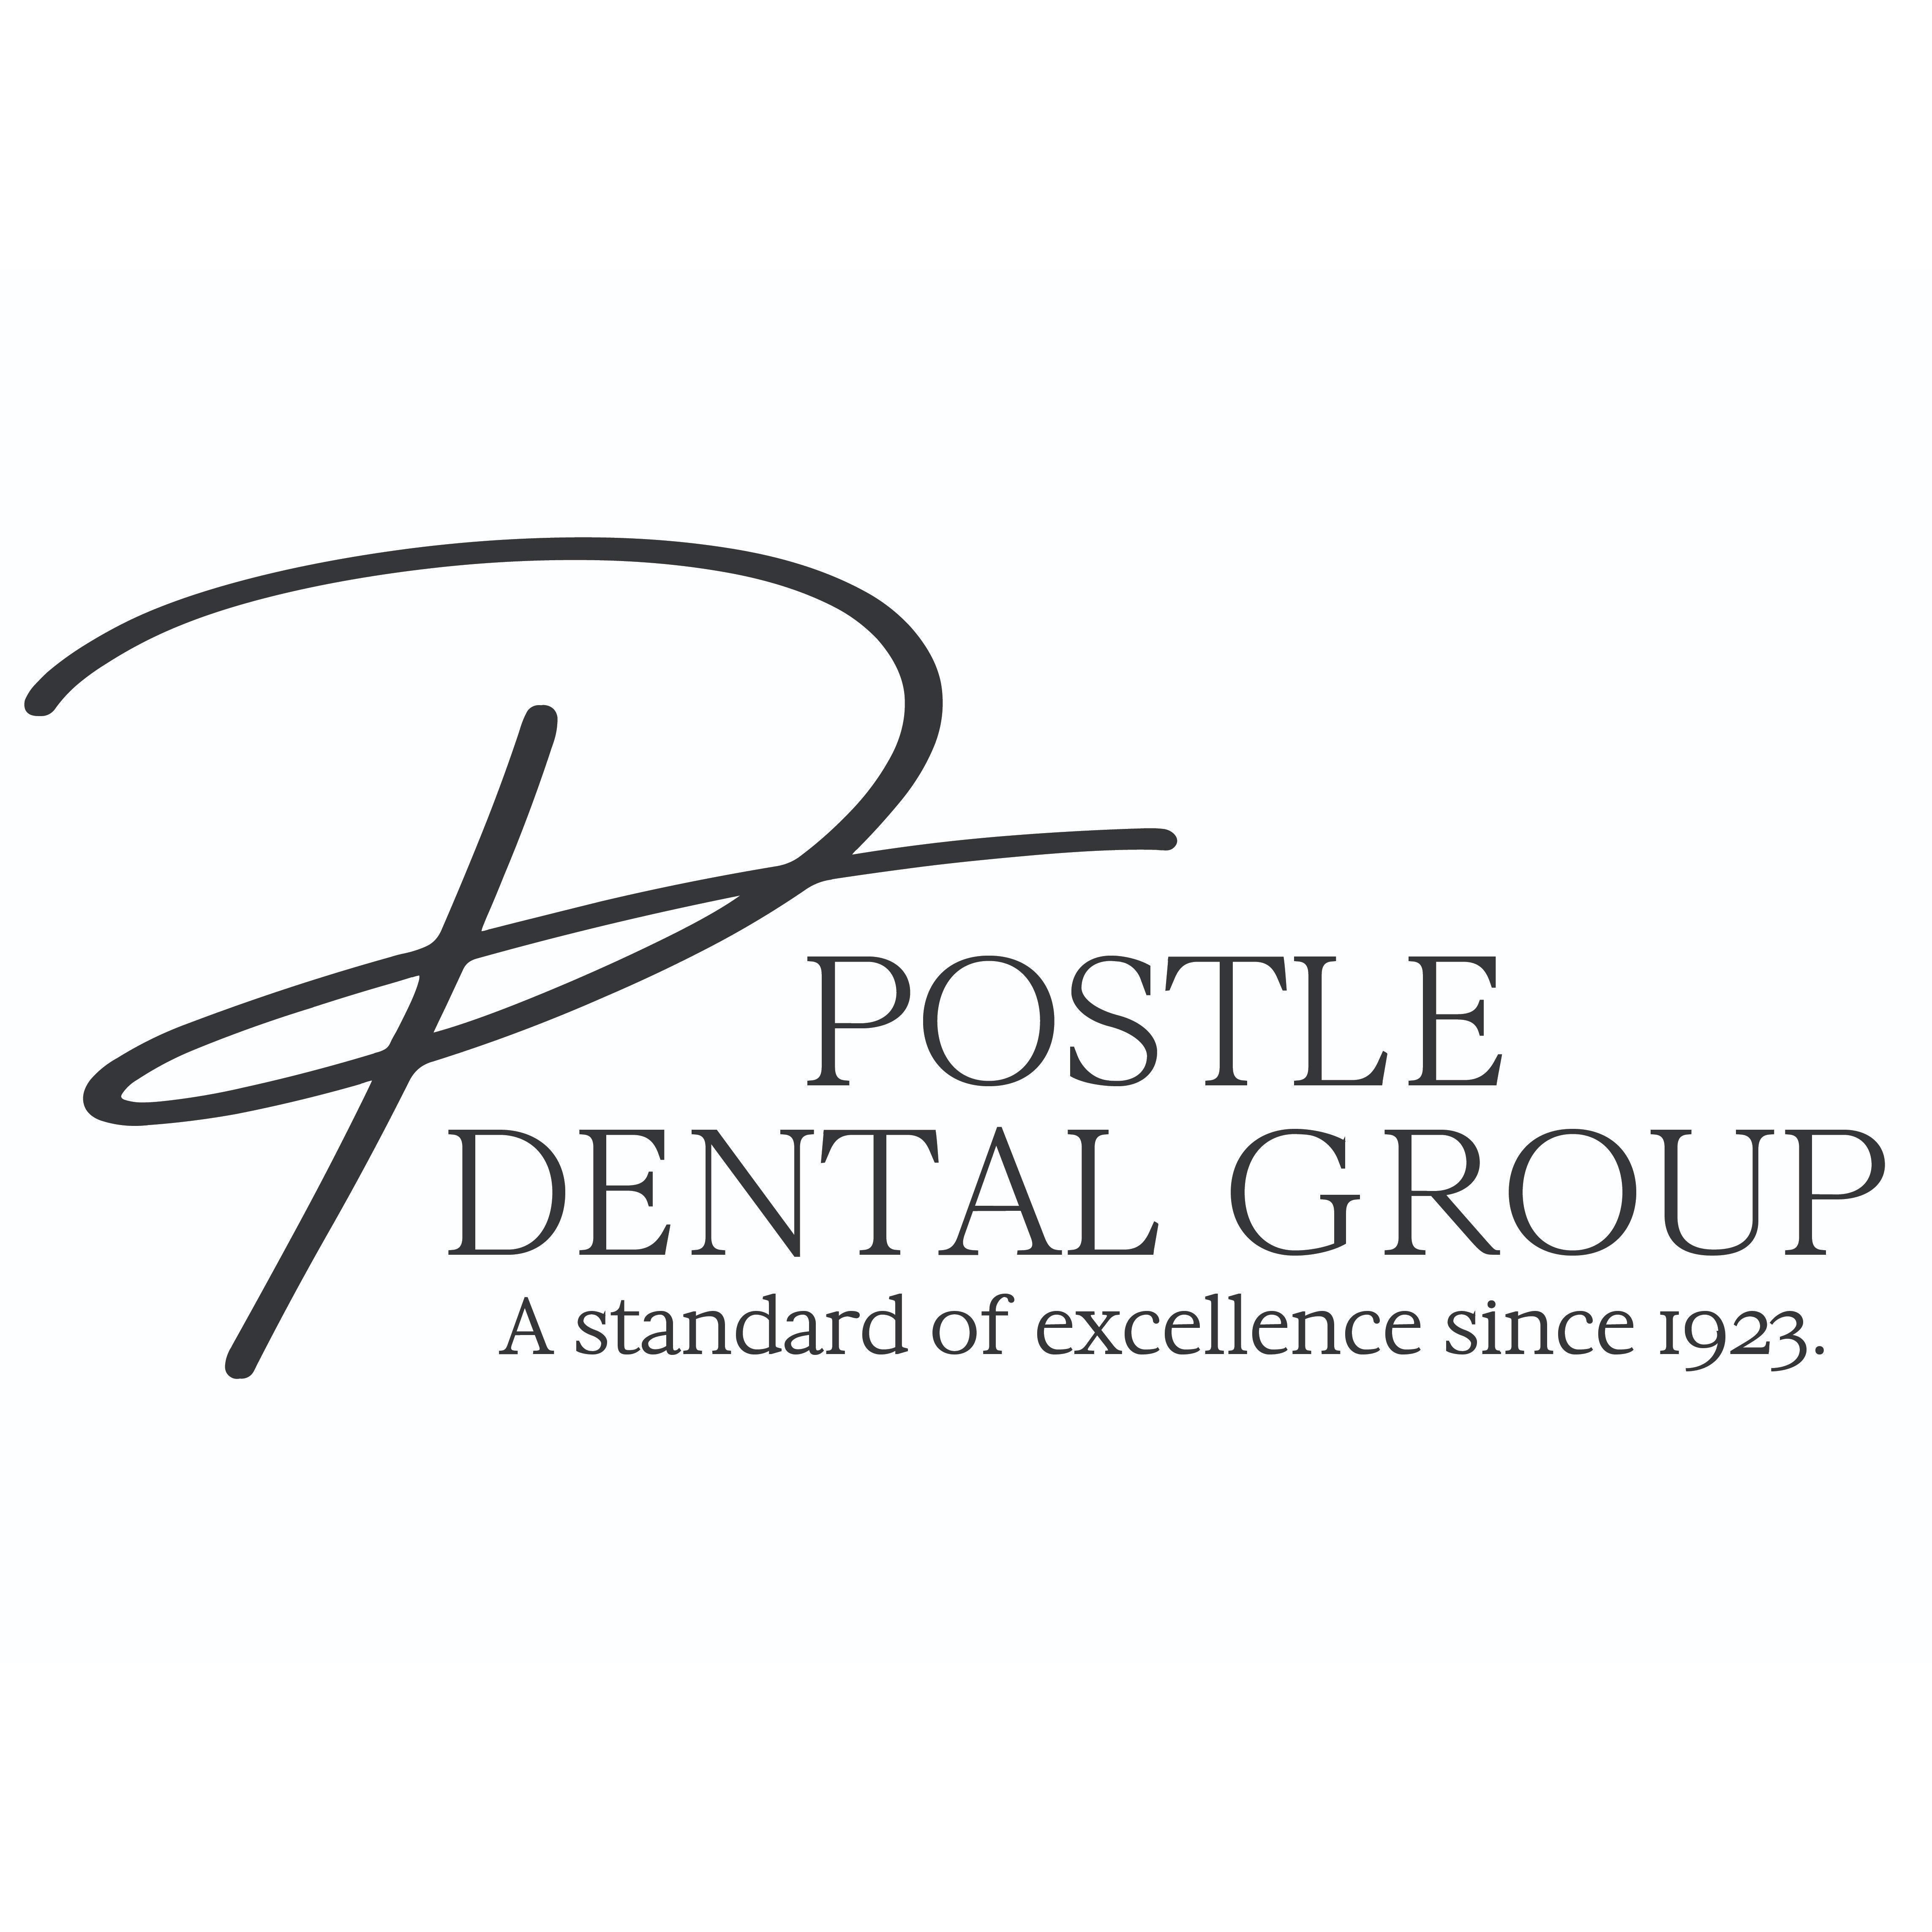 Postle Dental Group